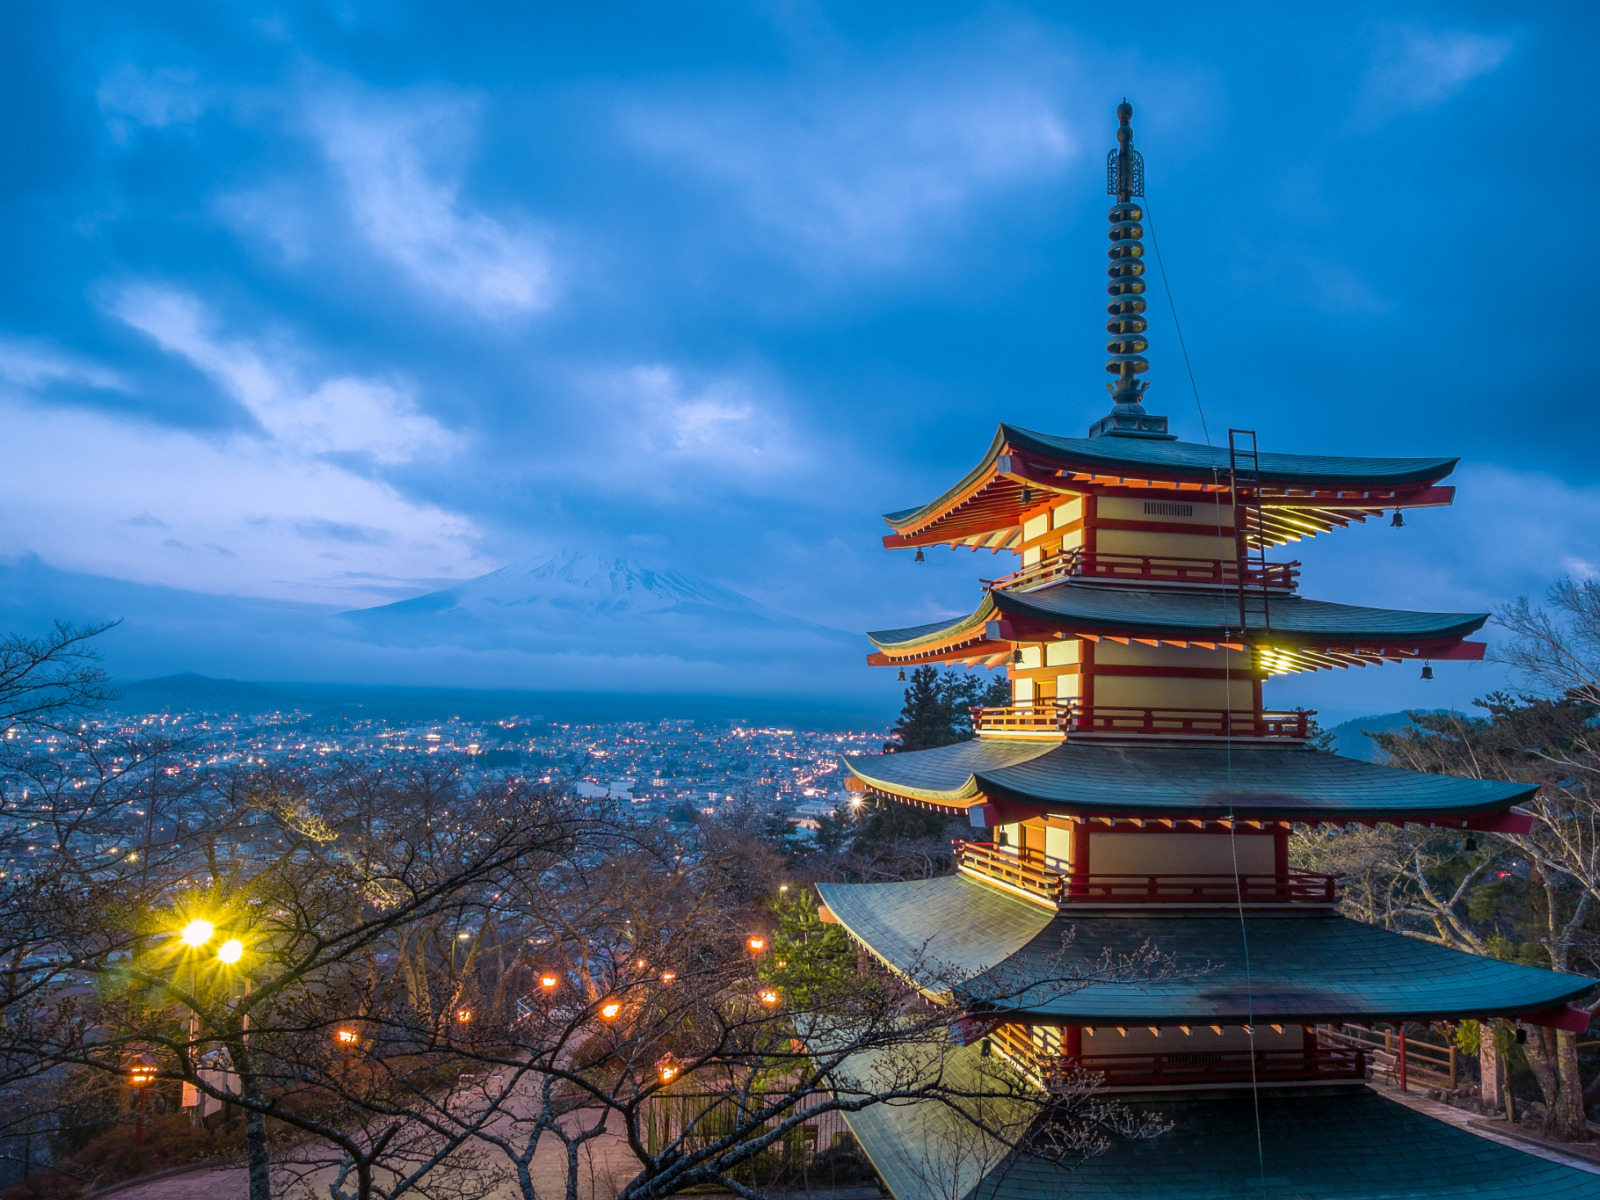 https://img3.goodfon.ru/original/1600x1200/9/f6/yaponiya-pagoda-svet-zakat.jpg